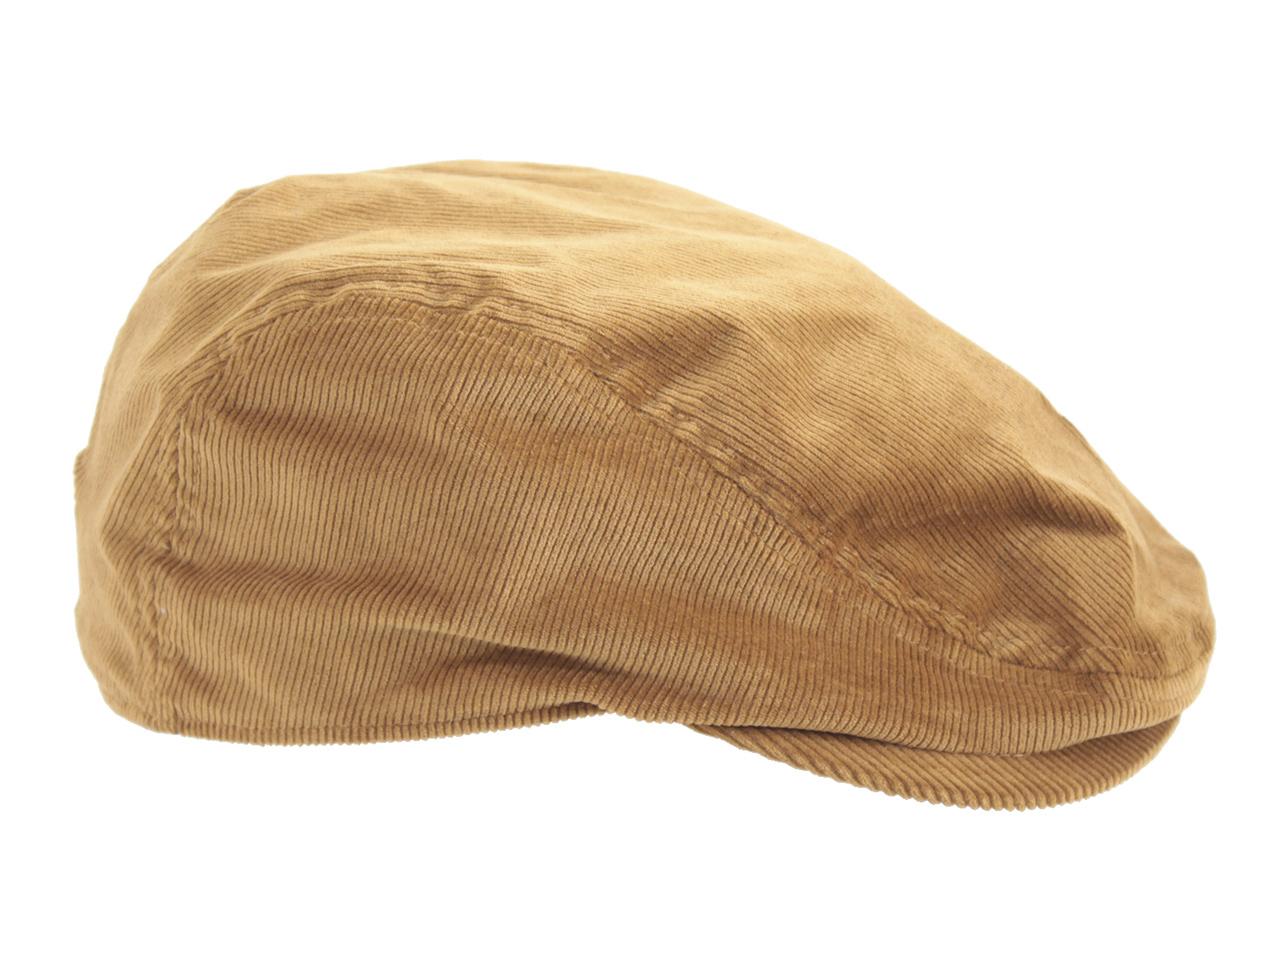 a848b51492bc05 Kangol Men's Cord Ivy Flat Cap Hat   eBay